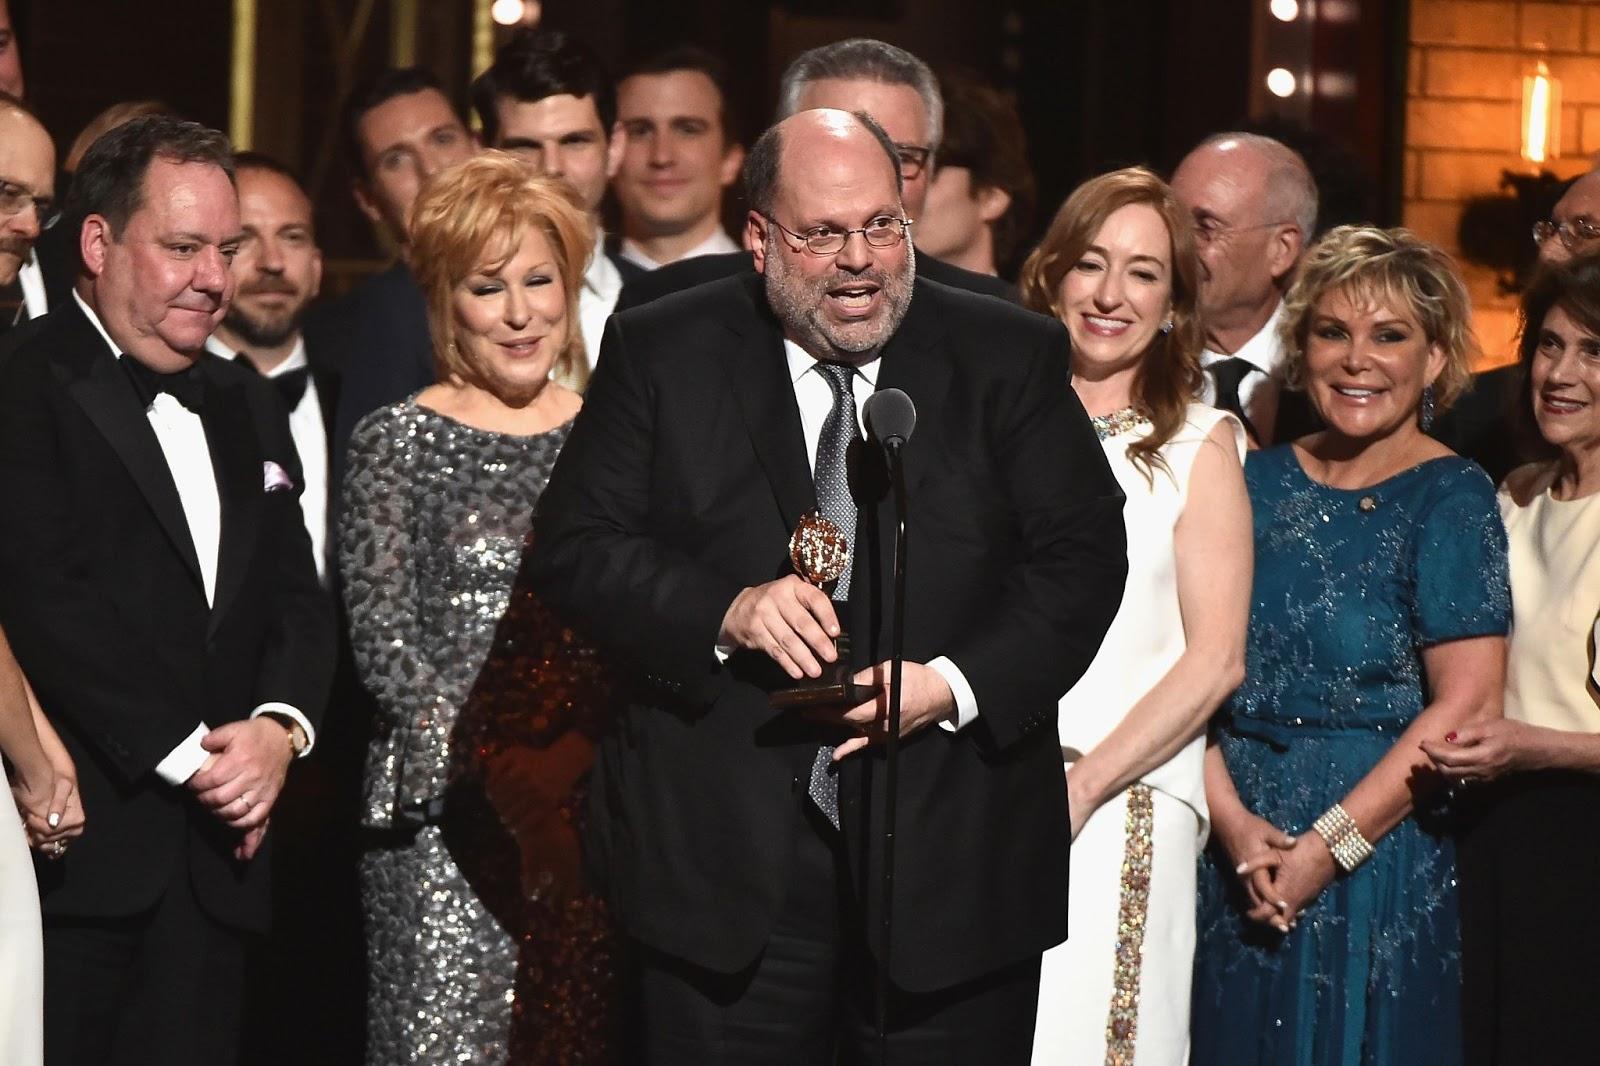 Oscar Award-Winning Producer Scott Rudin Steps Down Amid Abuse Allegations